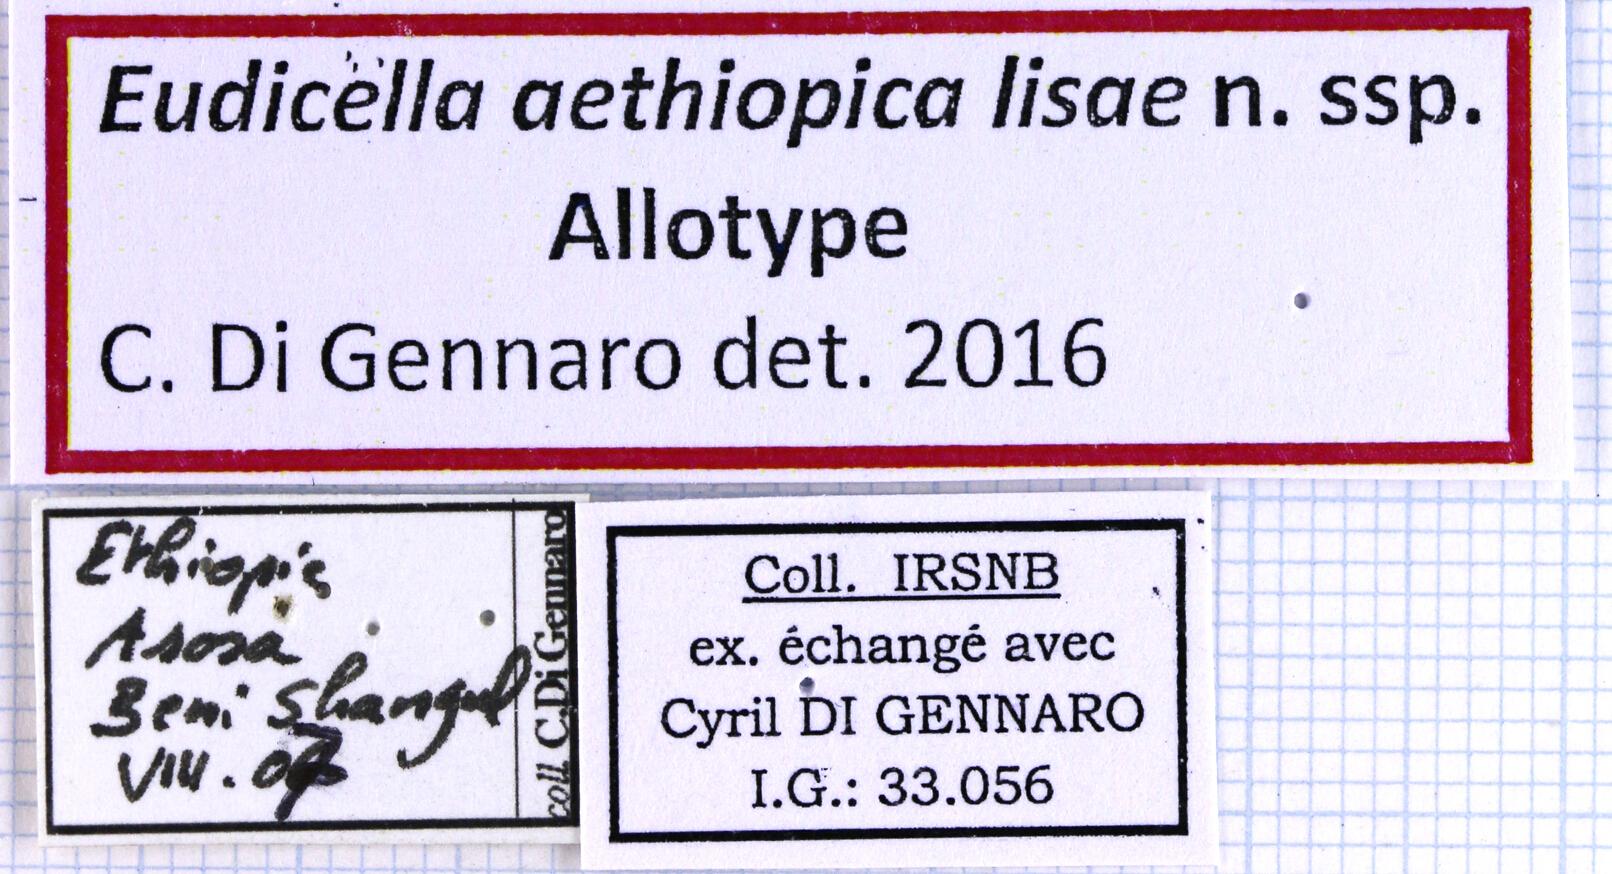 Eudicella aethiopica lisae label 49932.jpg